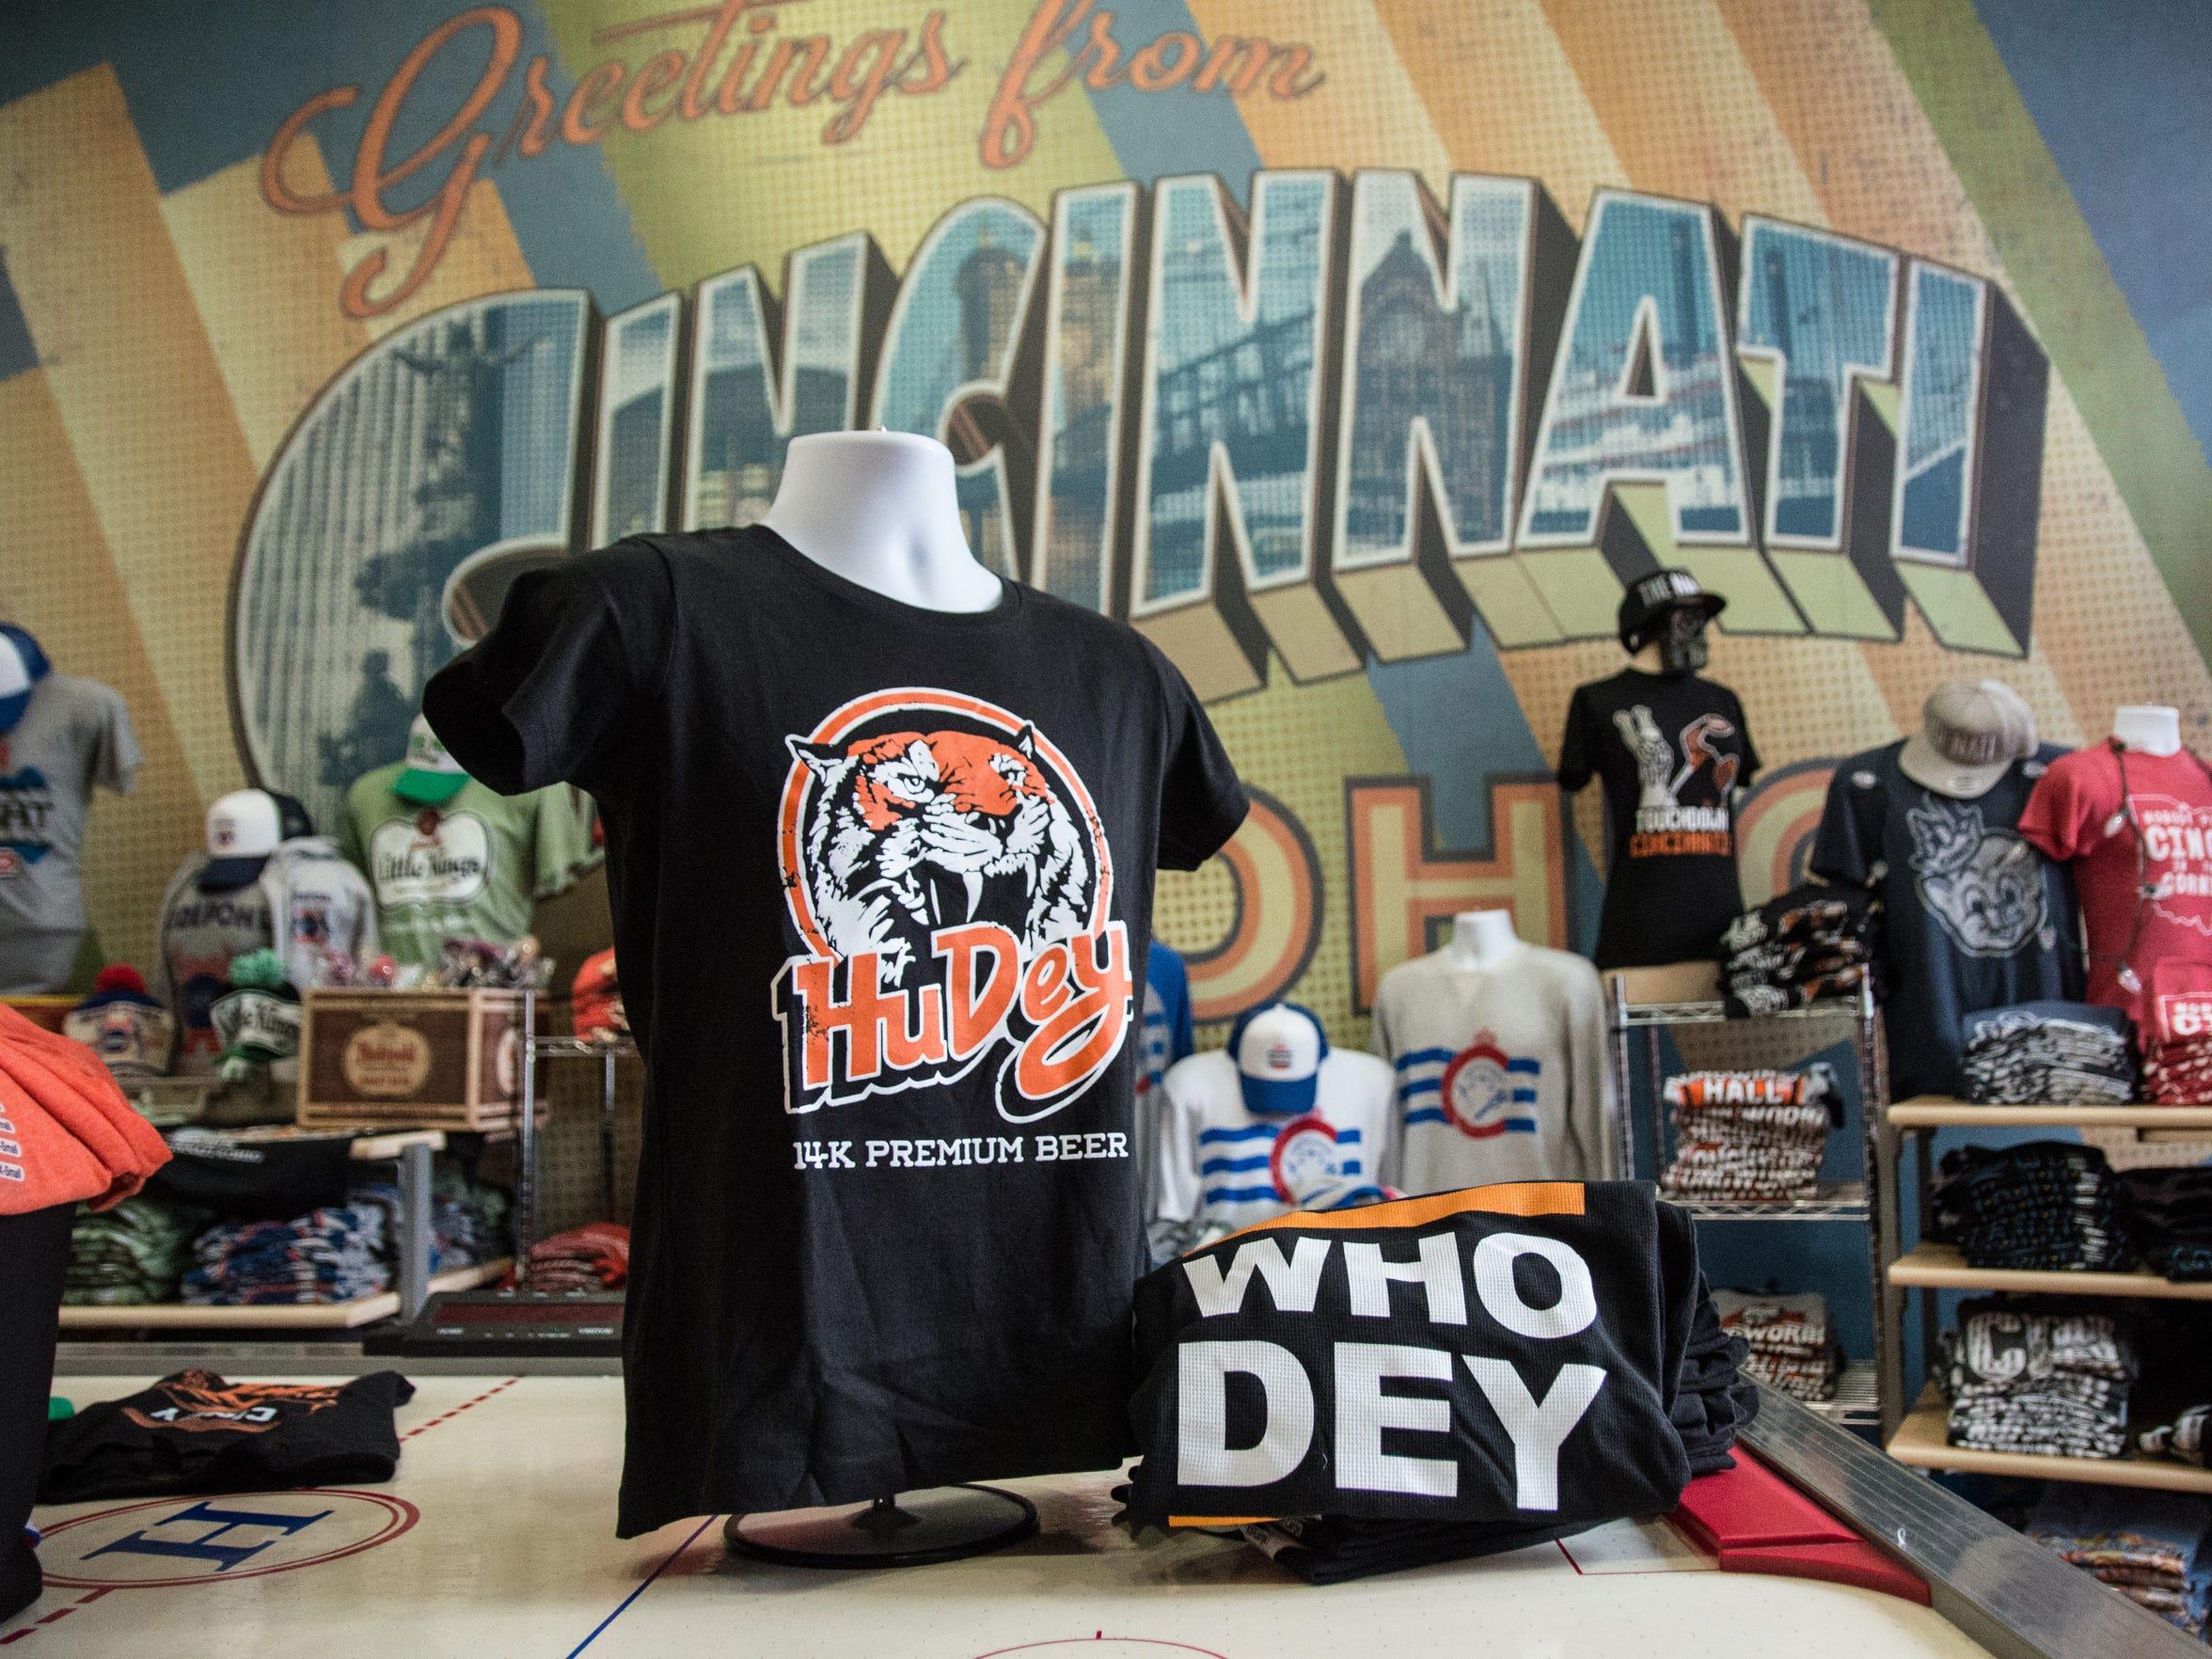 CincyShirts, located on Main Street downtown Cincinnati,